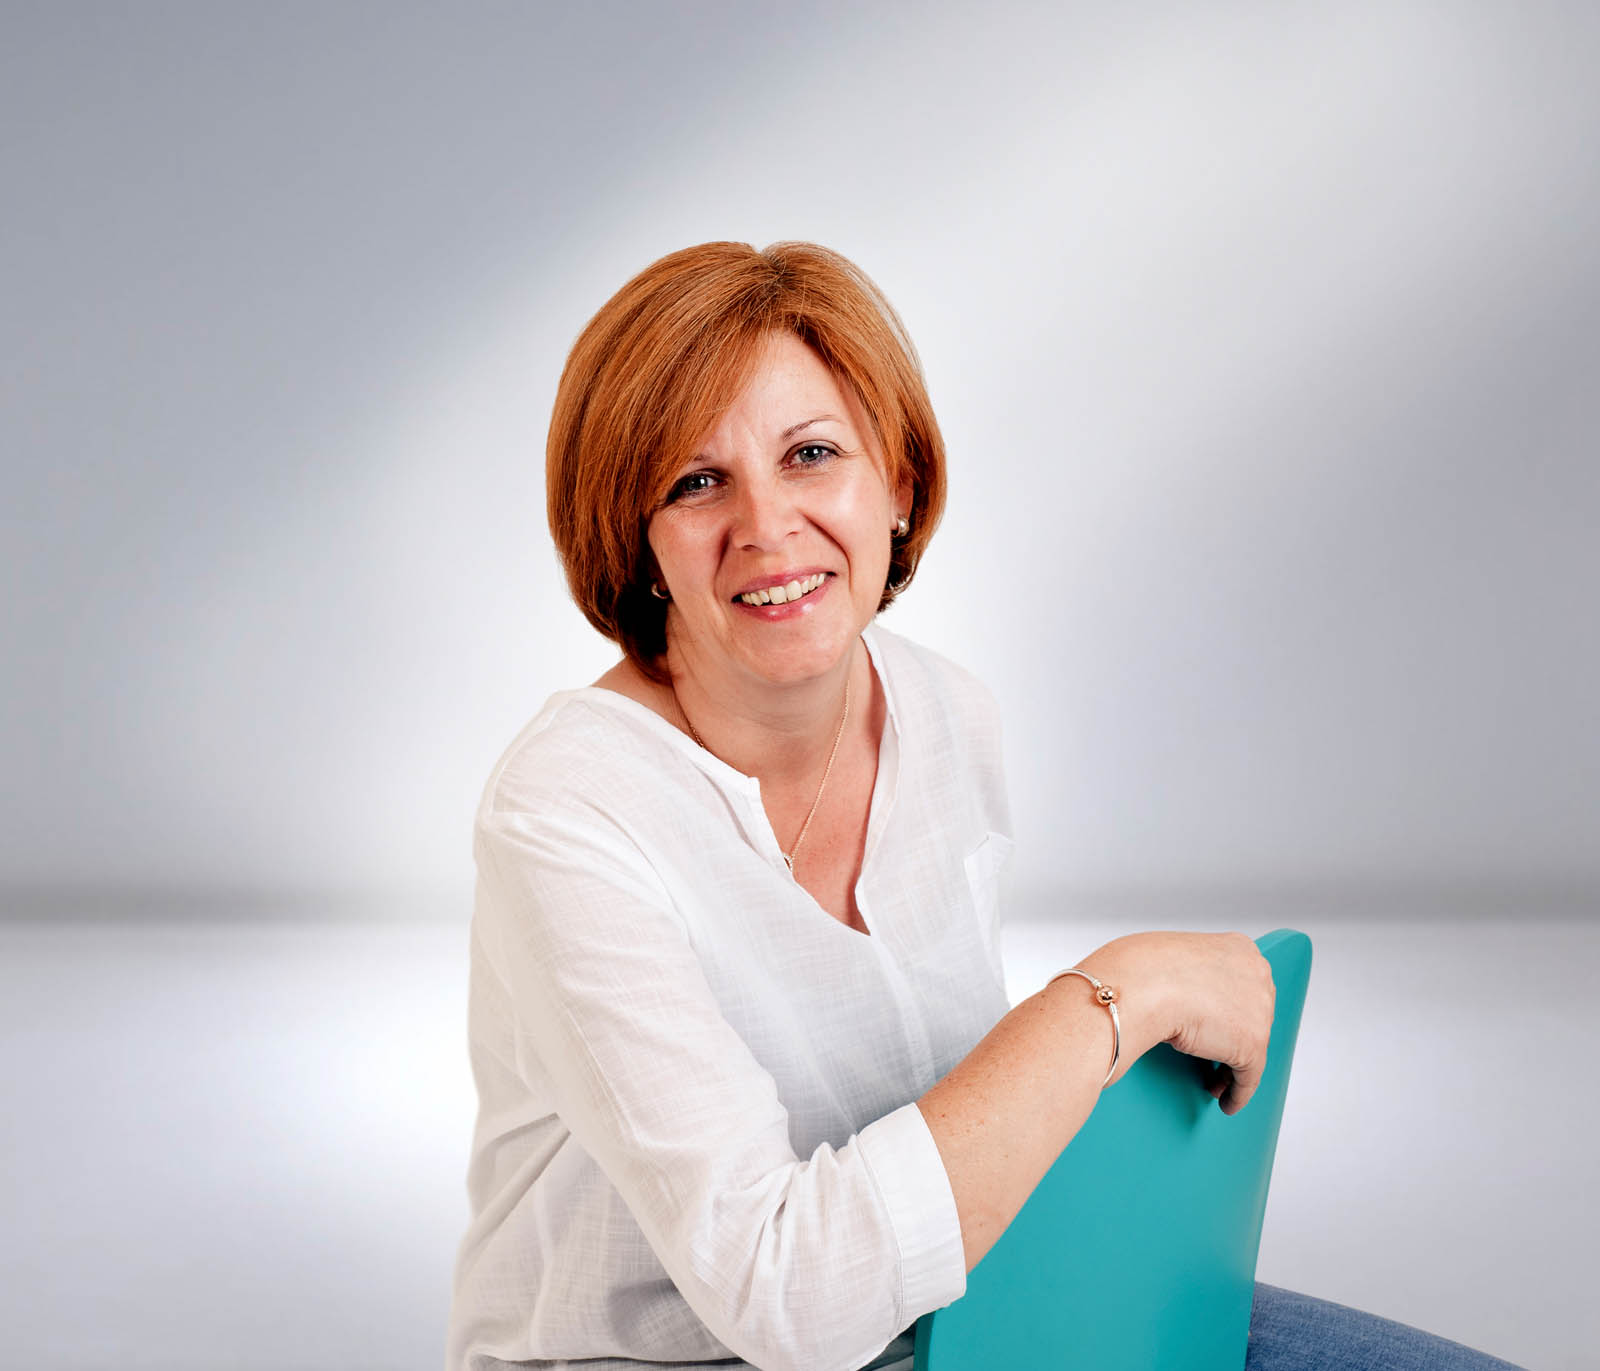 Maria_Czarnowski